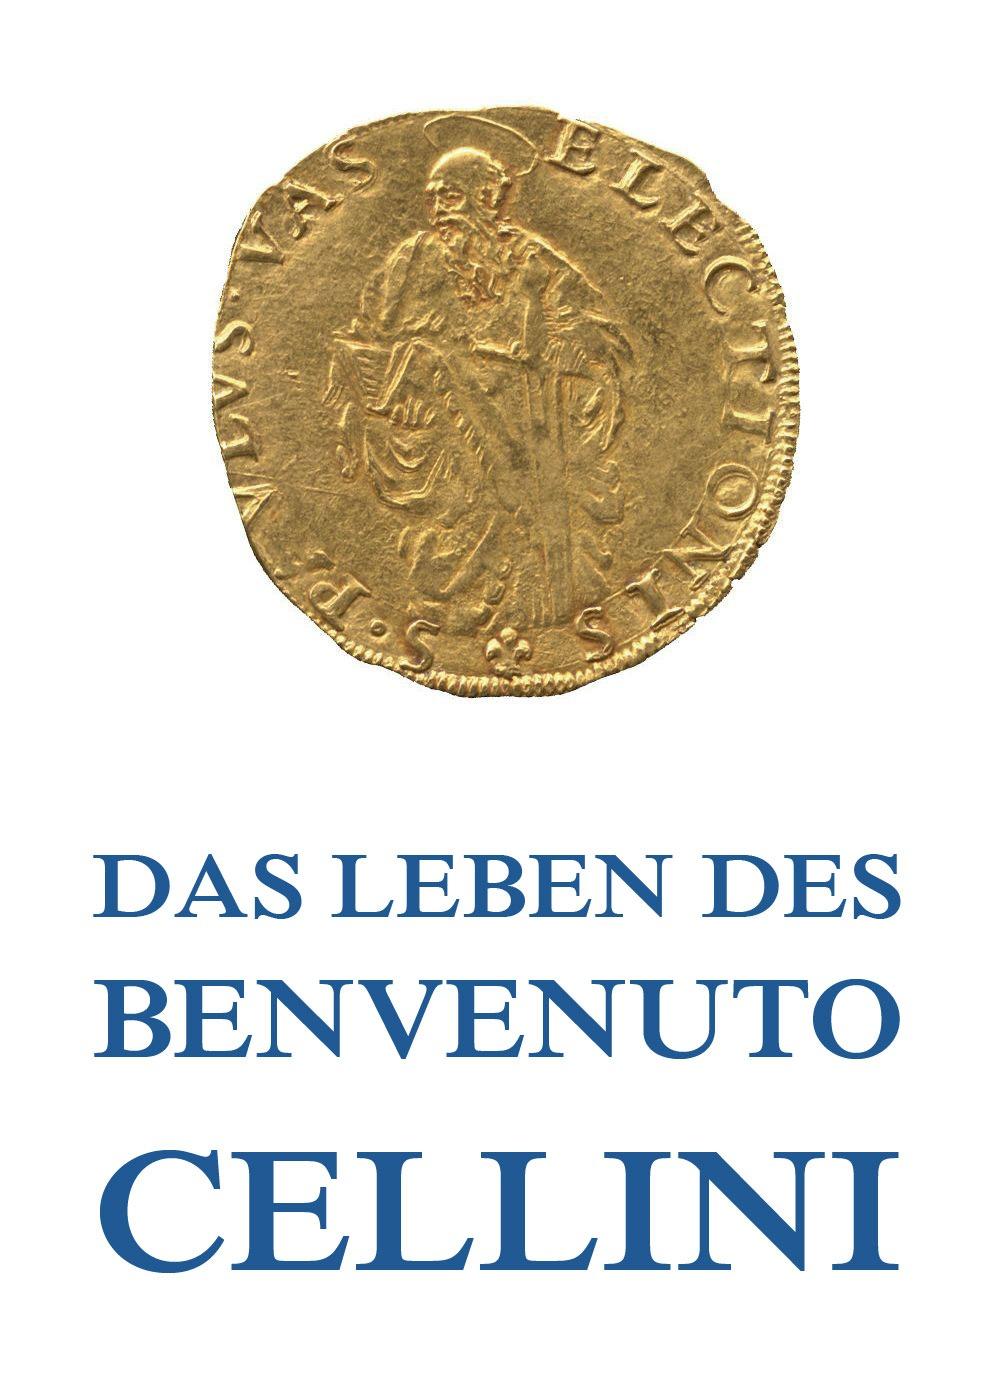 цены Benvenuto Cellini Leben des Benvenuto Cellini